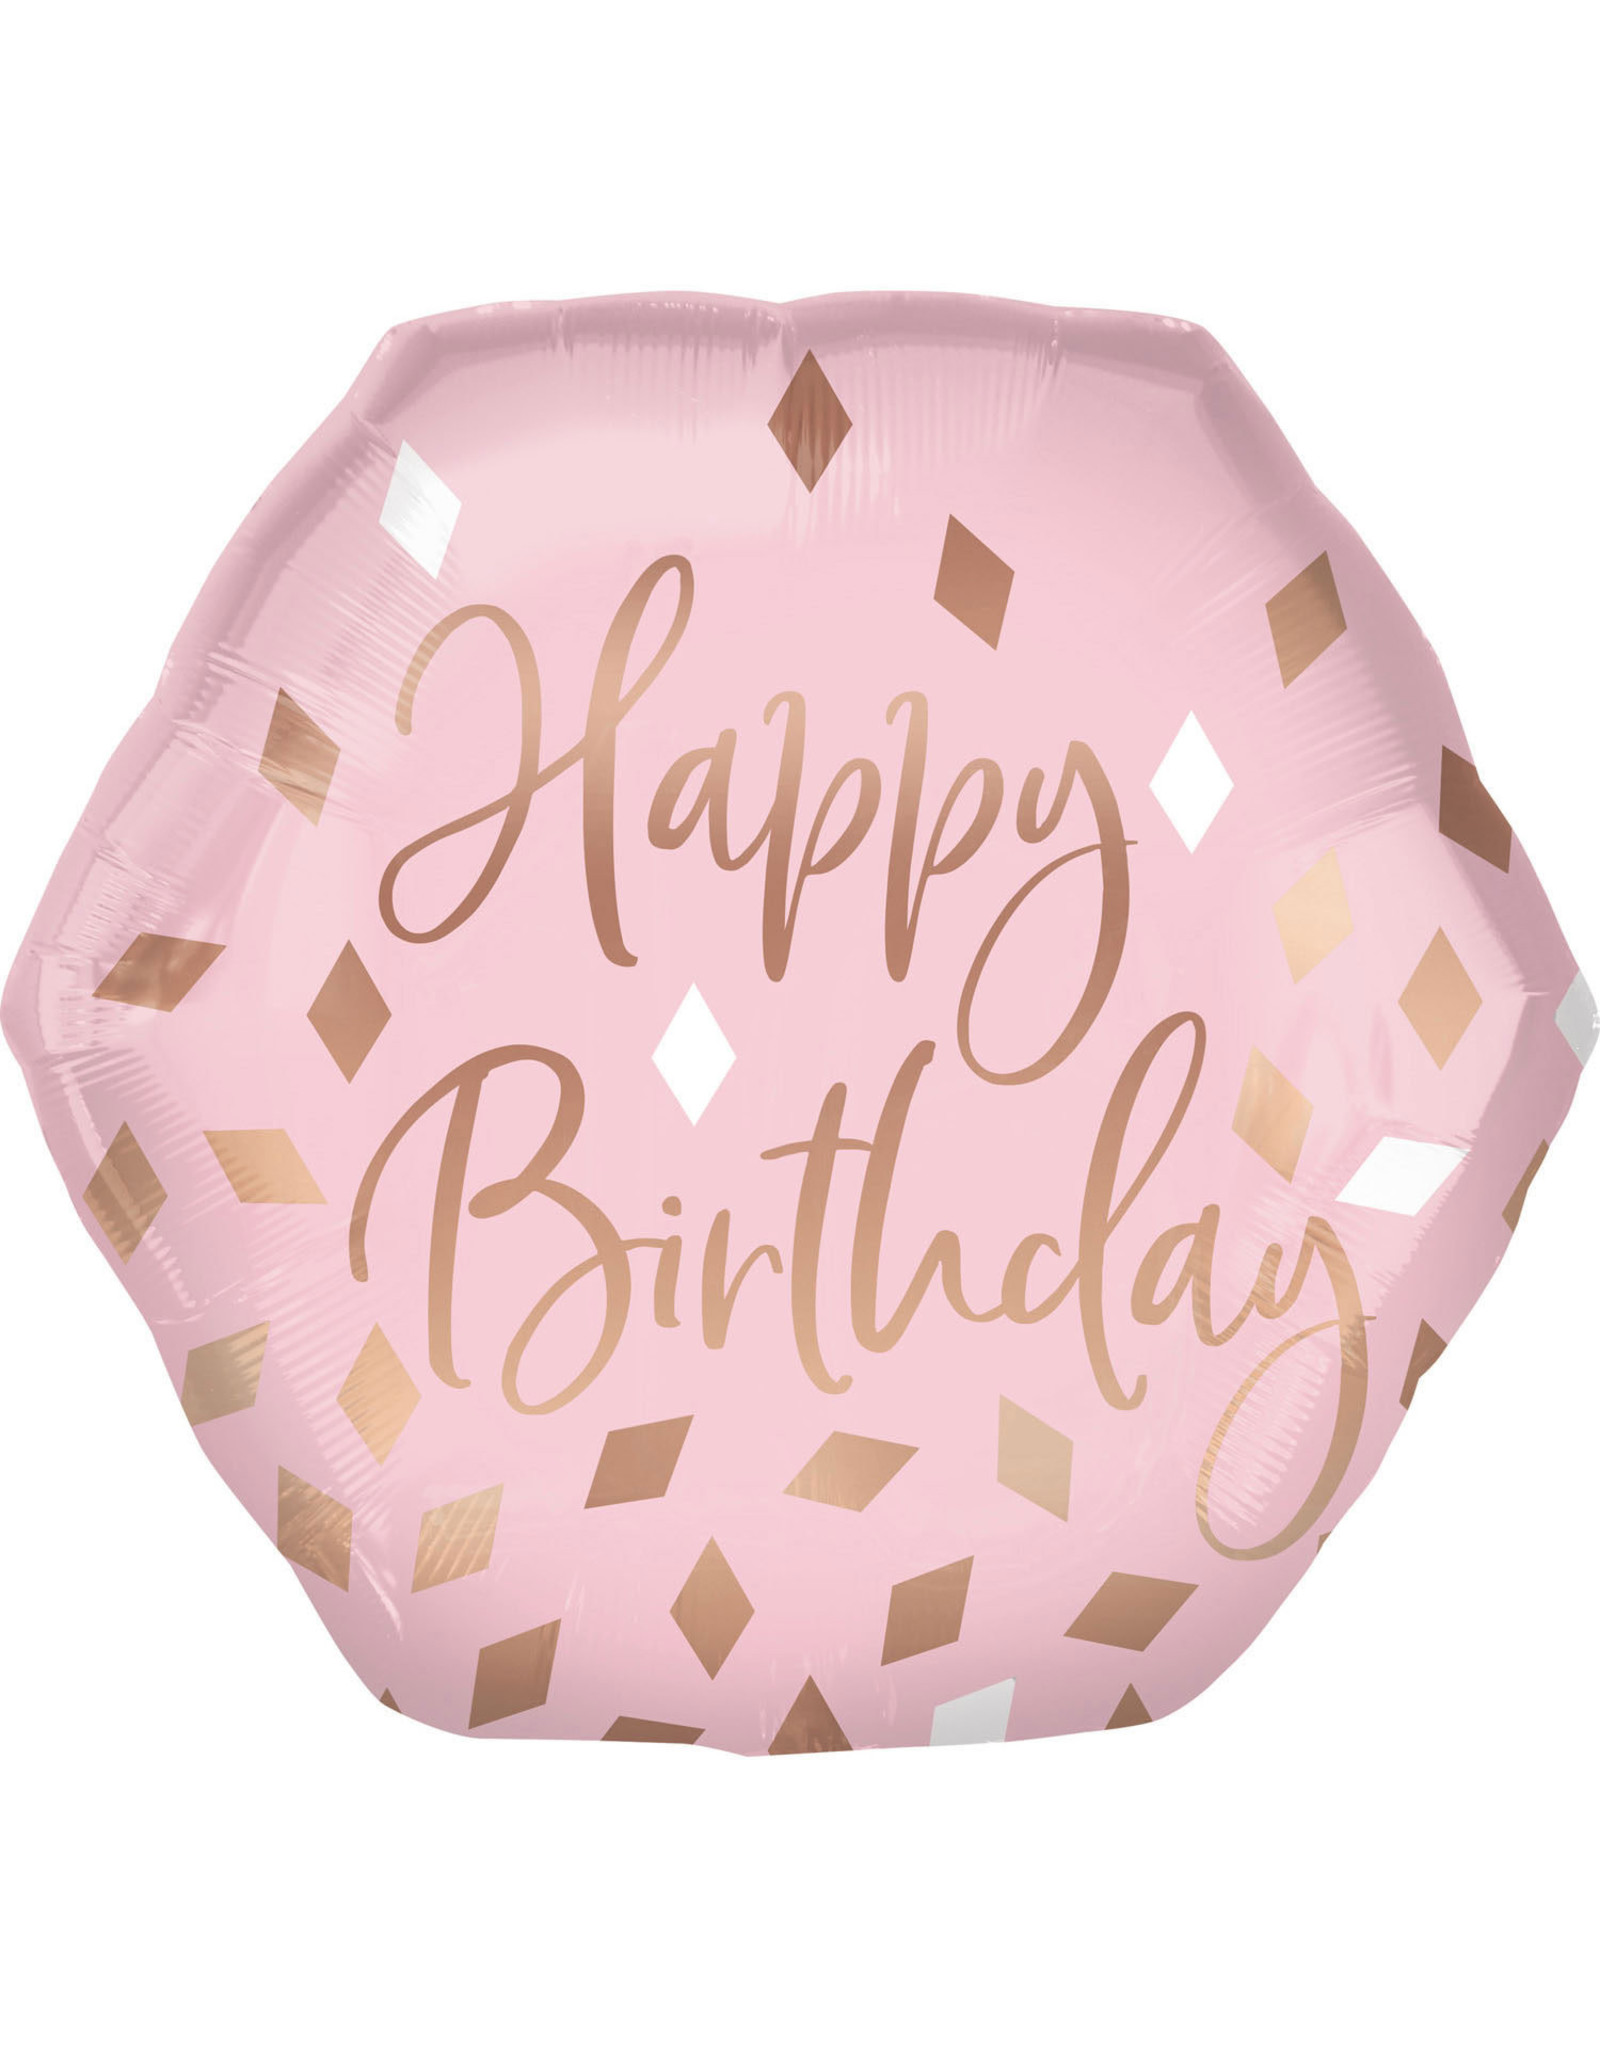 Amscan folieballon supershape happy birthday rose gold 58 x 55 cm